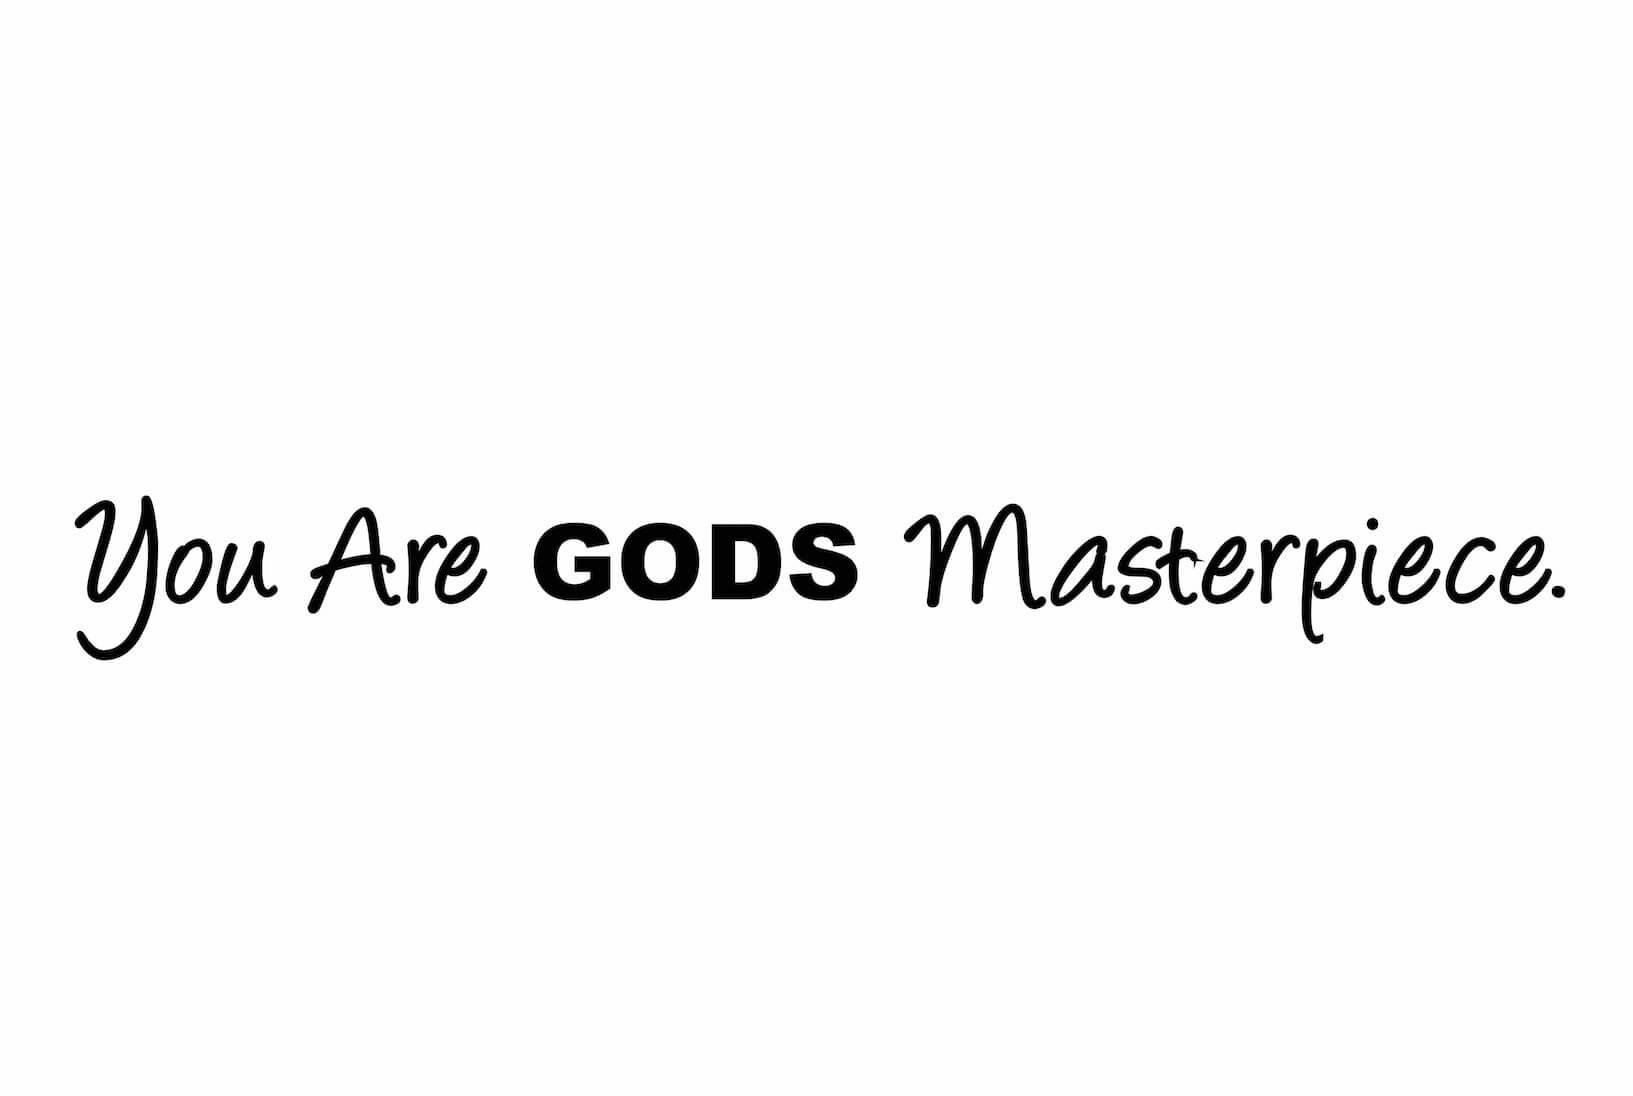 Muursticker You are Gods masterpiece